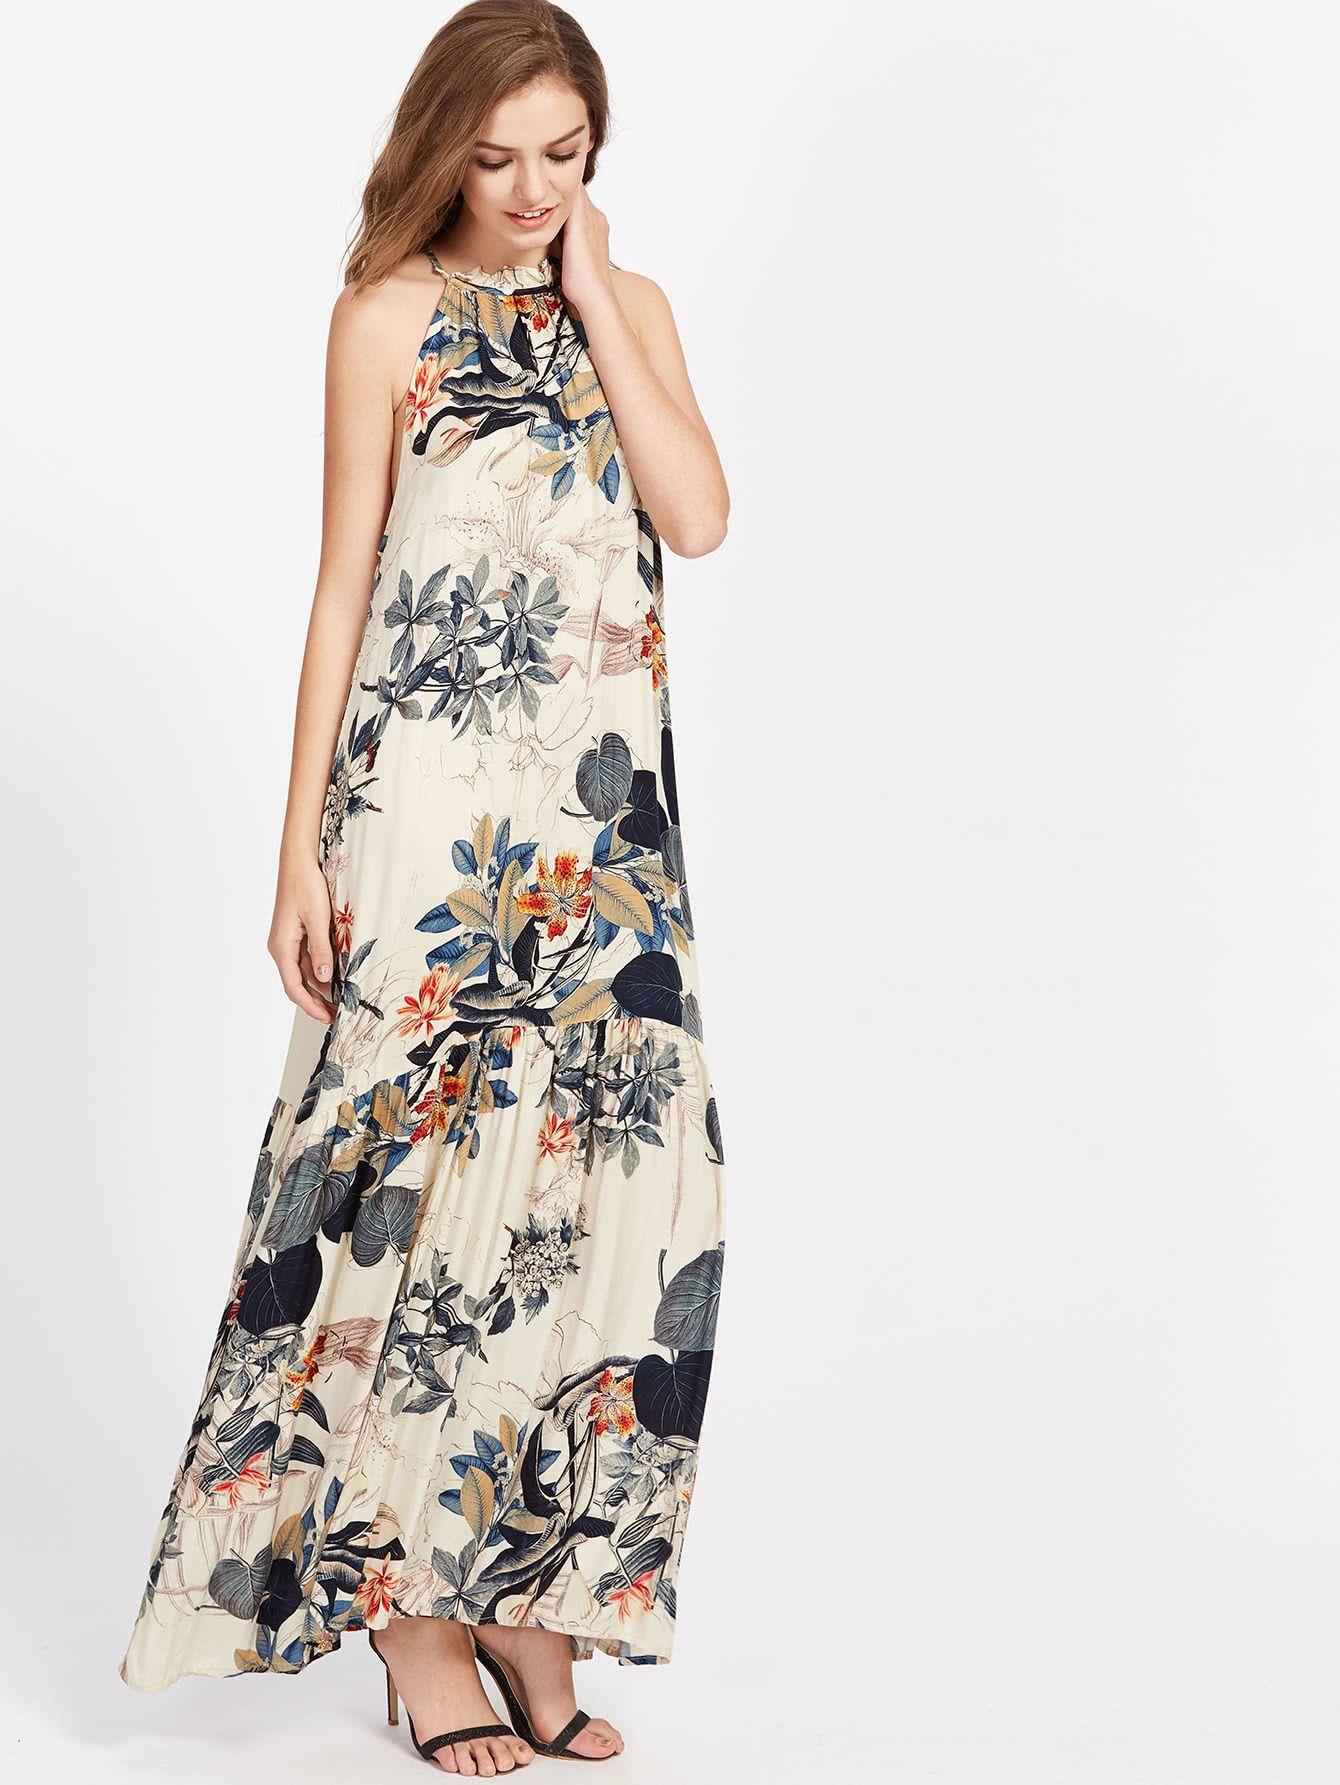 a2cb1b5c62b64 ¡Consigue este tipo de vestido informal de SheIn ahora! Haz clic para ver  los detalles. Envíos gratis a toda España. Tropical Print Frilled Halter  Neck ...